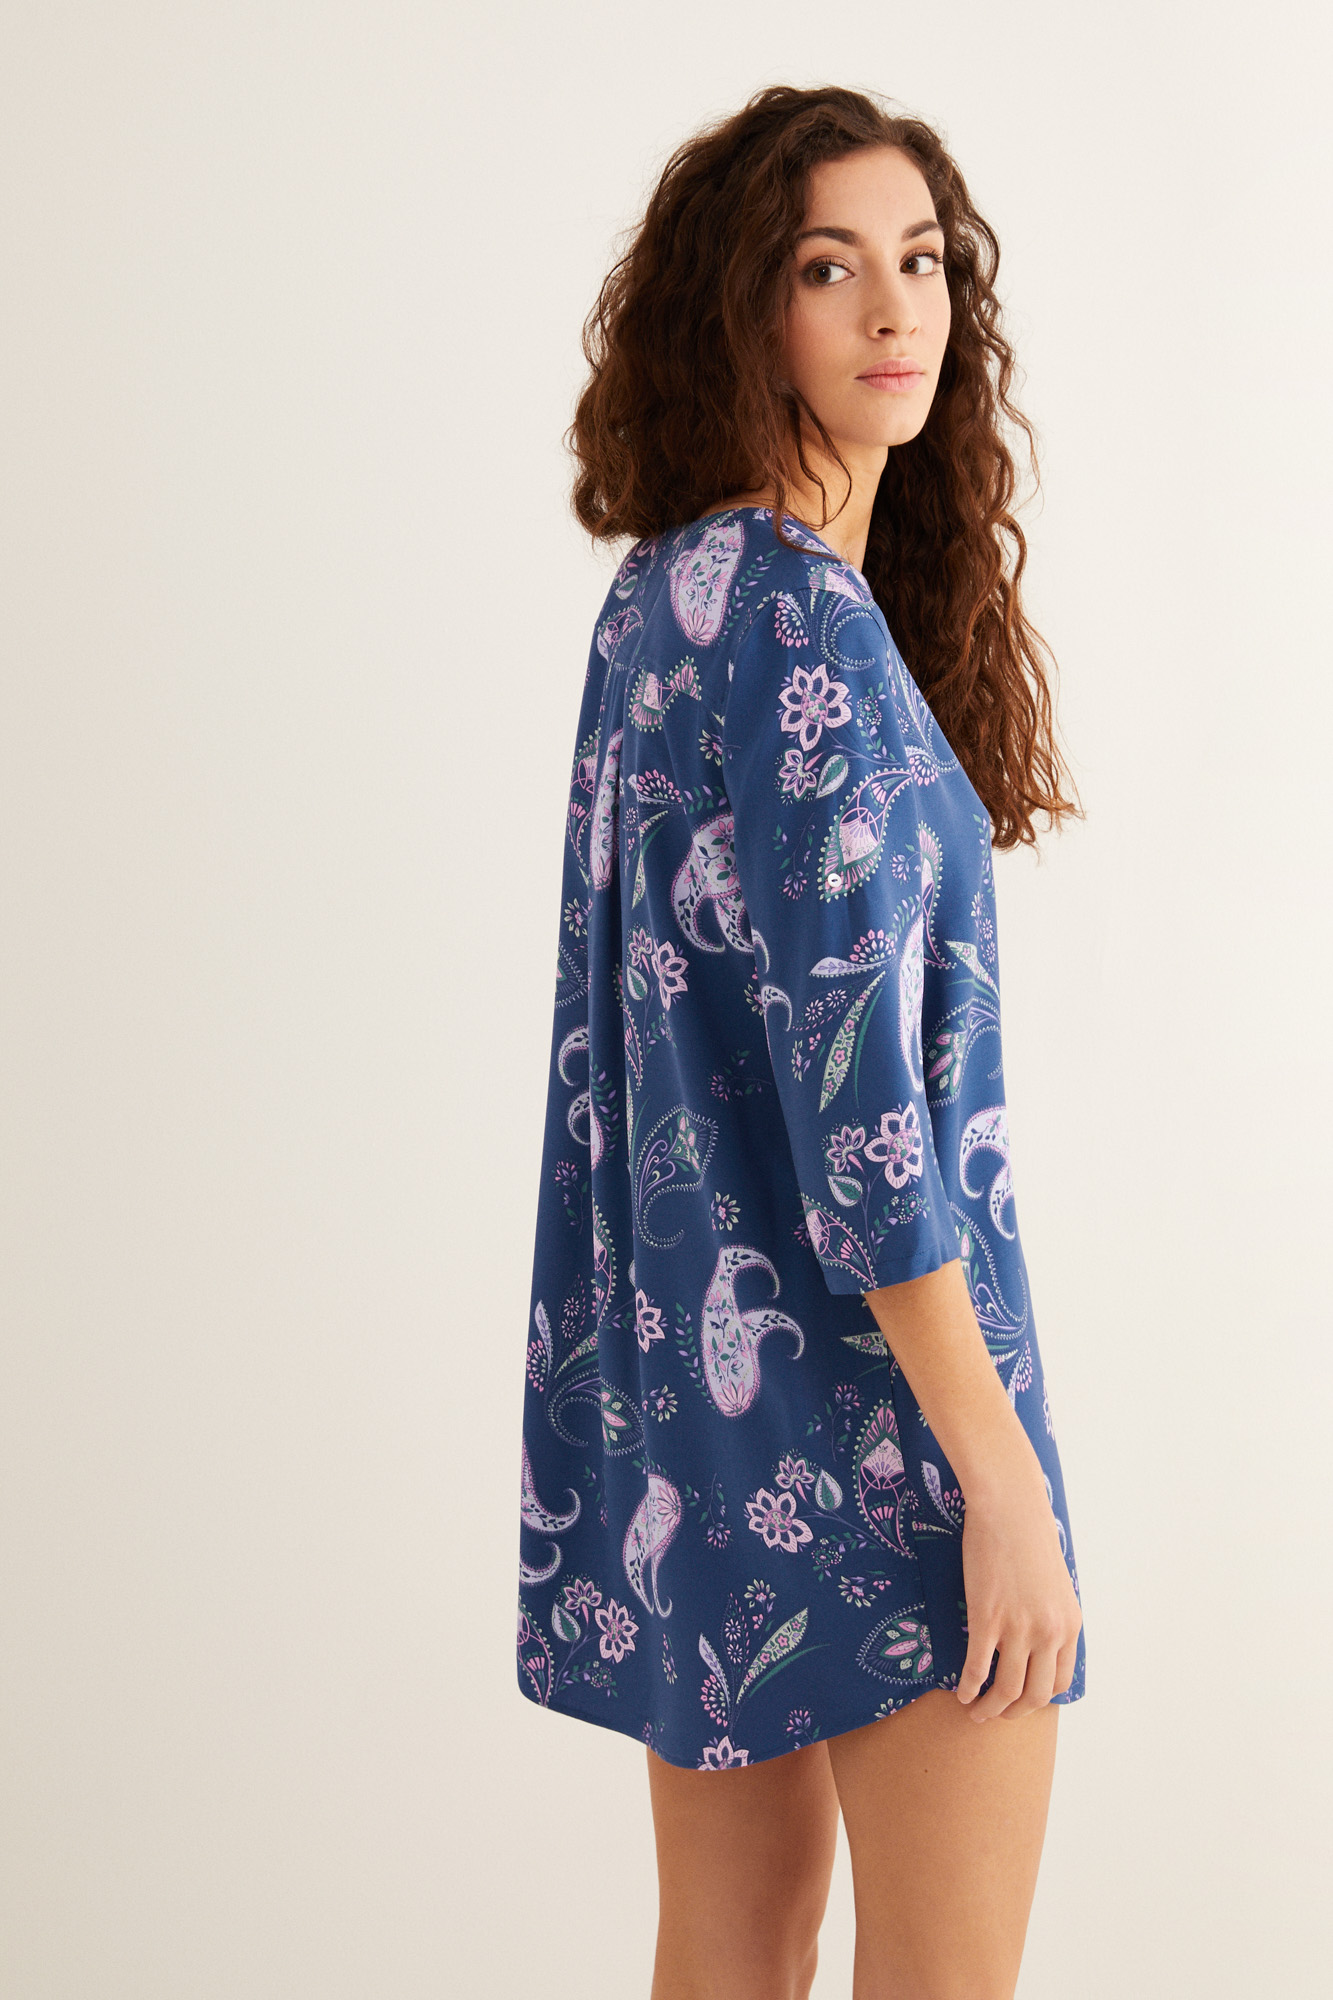 Camisola corta estampada | Pijamas | Fifty